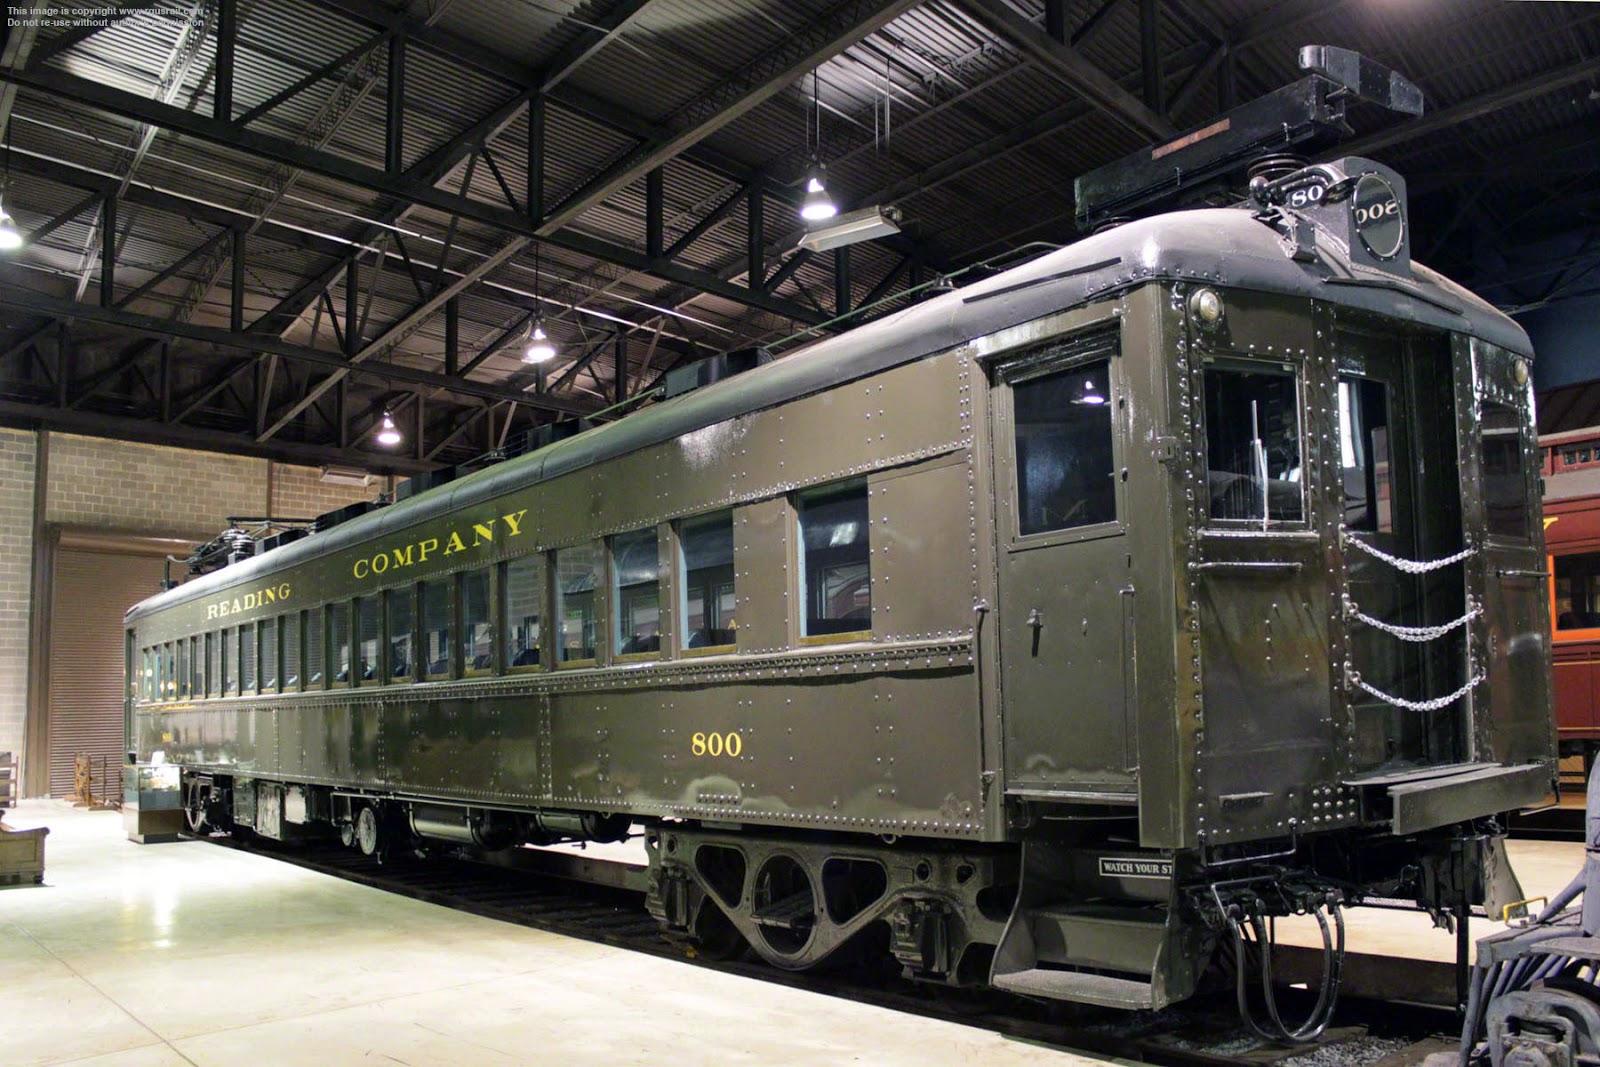 Transpress Nz Reading Railroad Electric Commuter Train